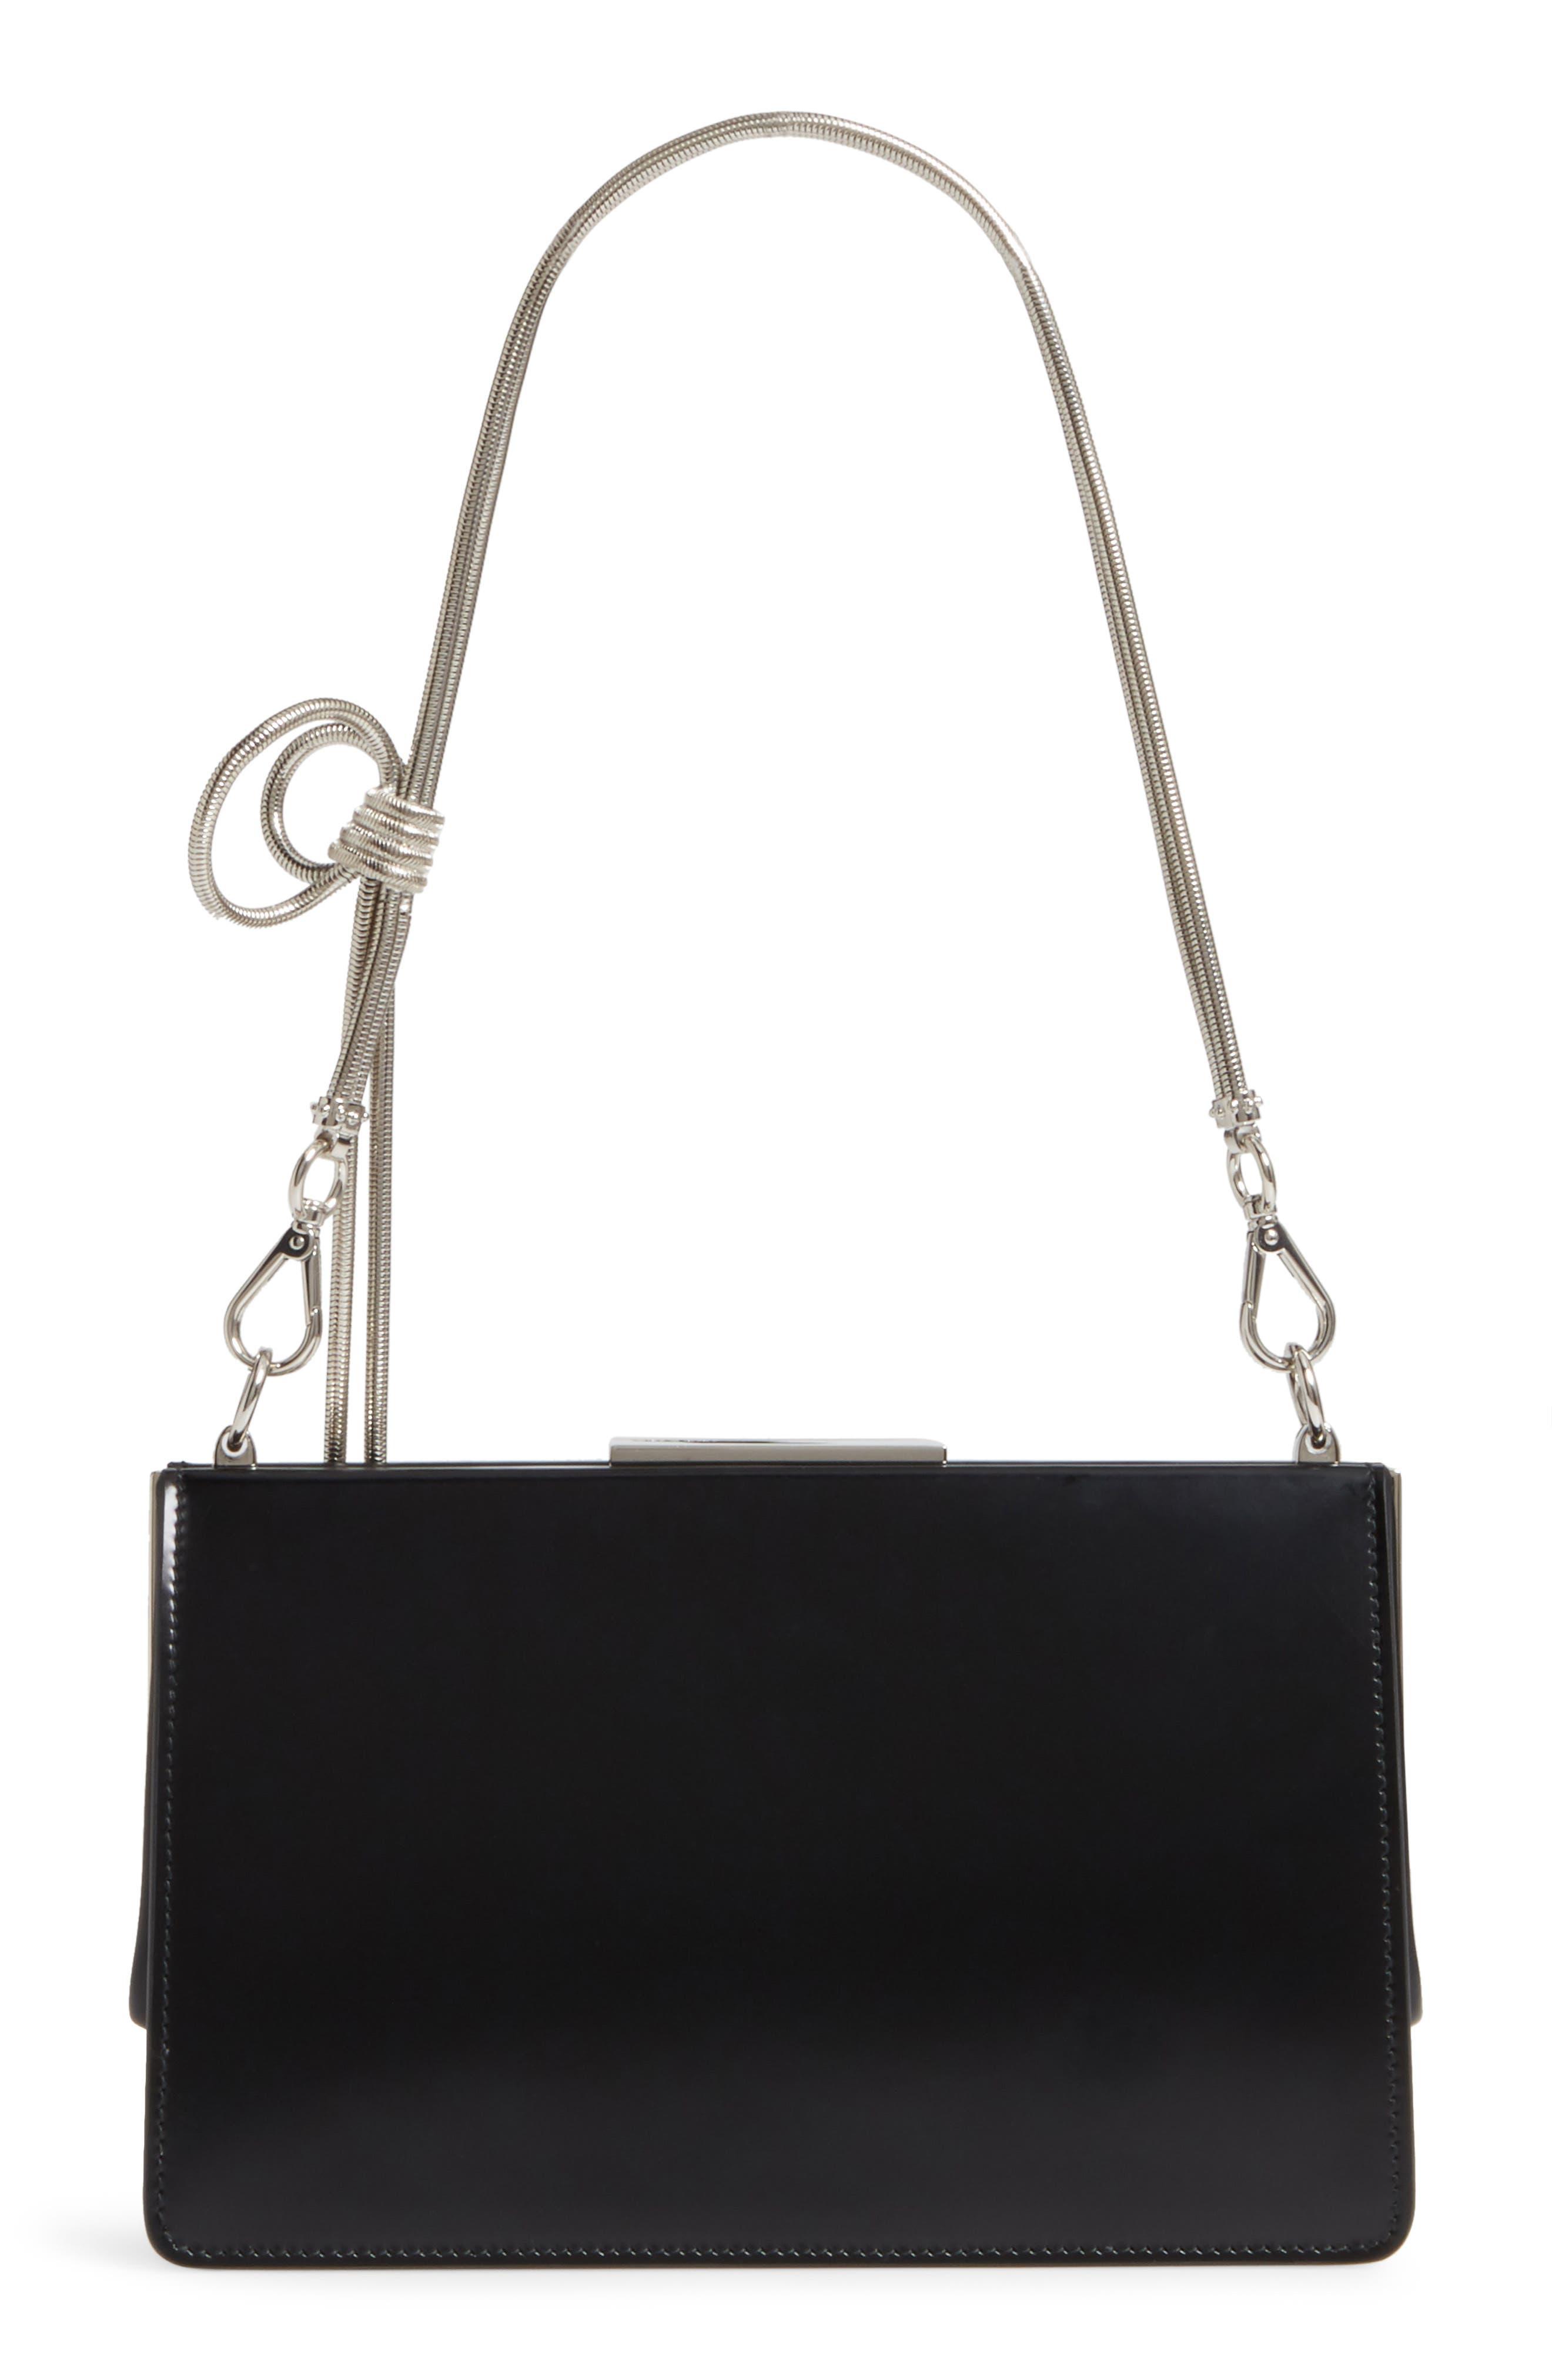 PRADA,                             Spazzolato Calfskin Crossbody Bag,                             Alternate thumbnail 4, color,                             001